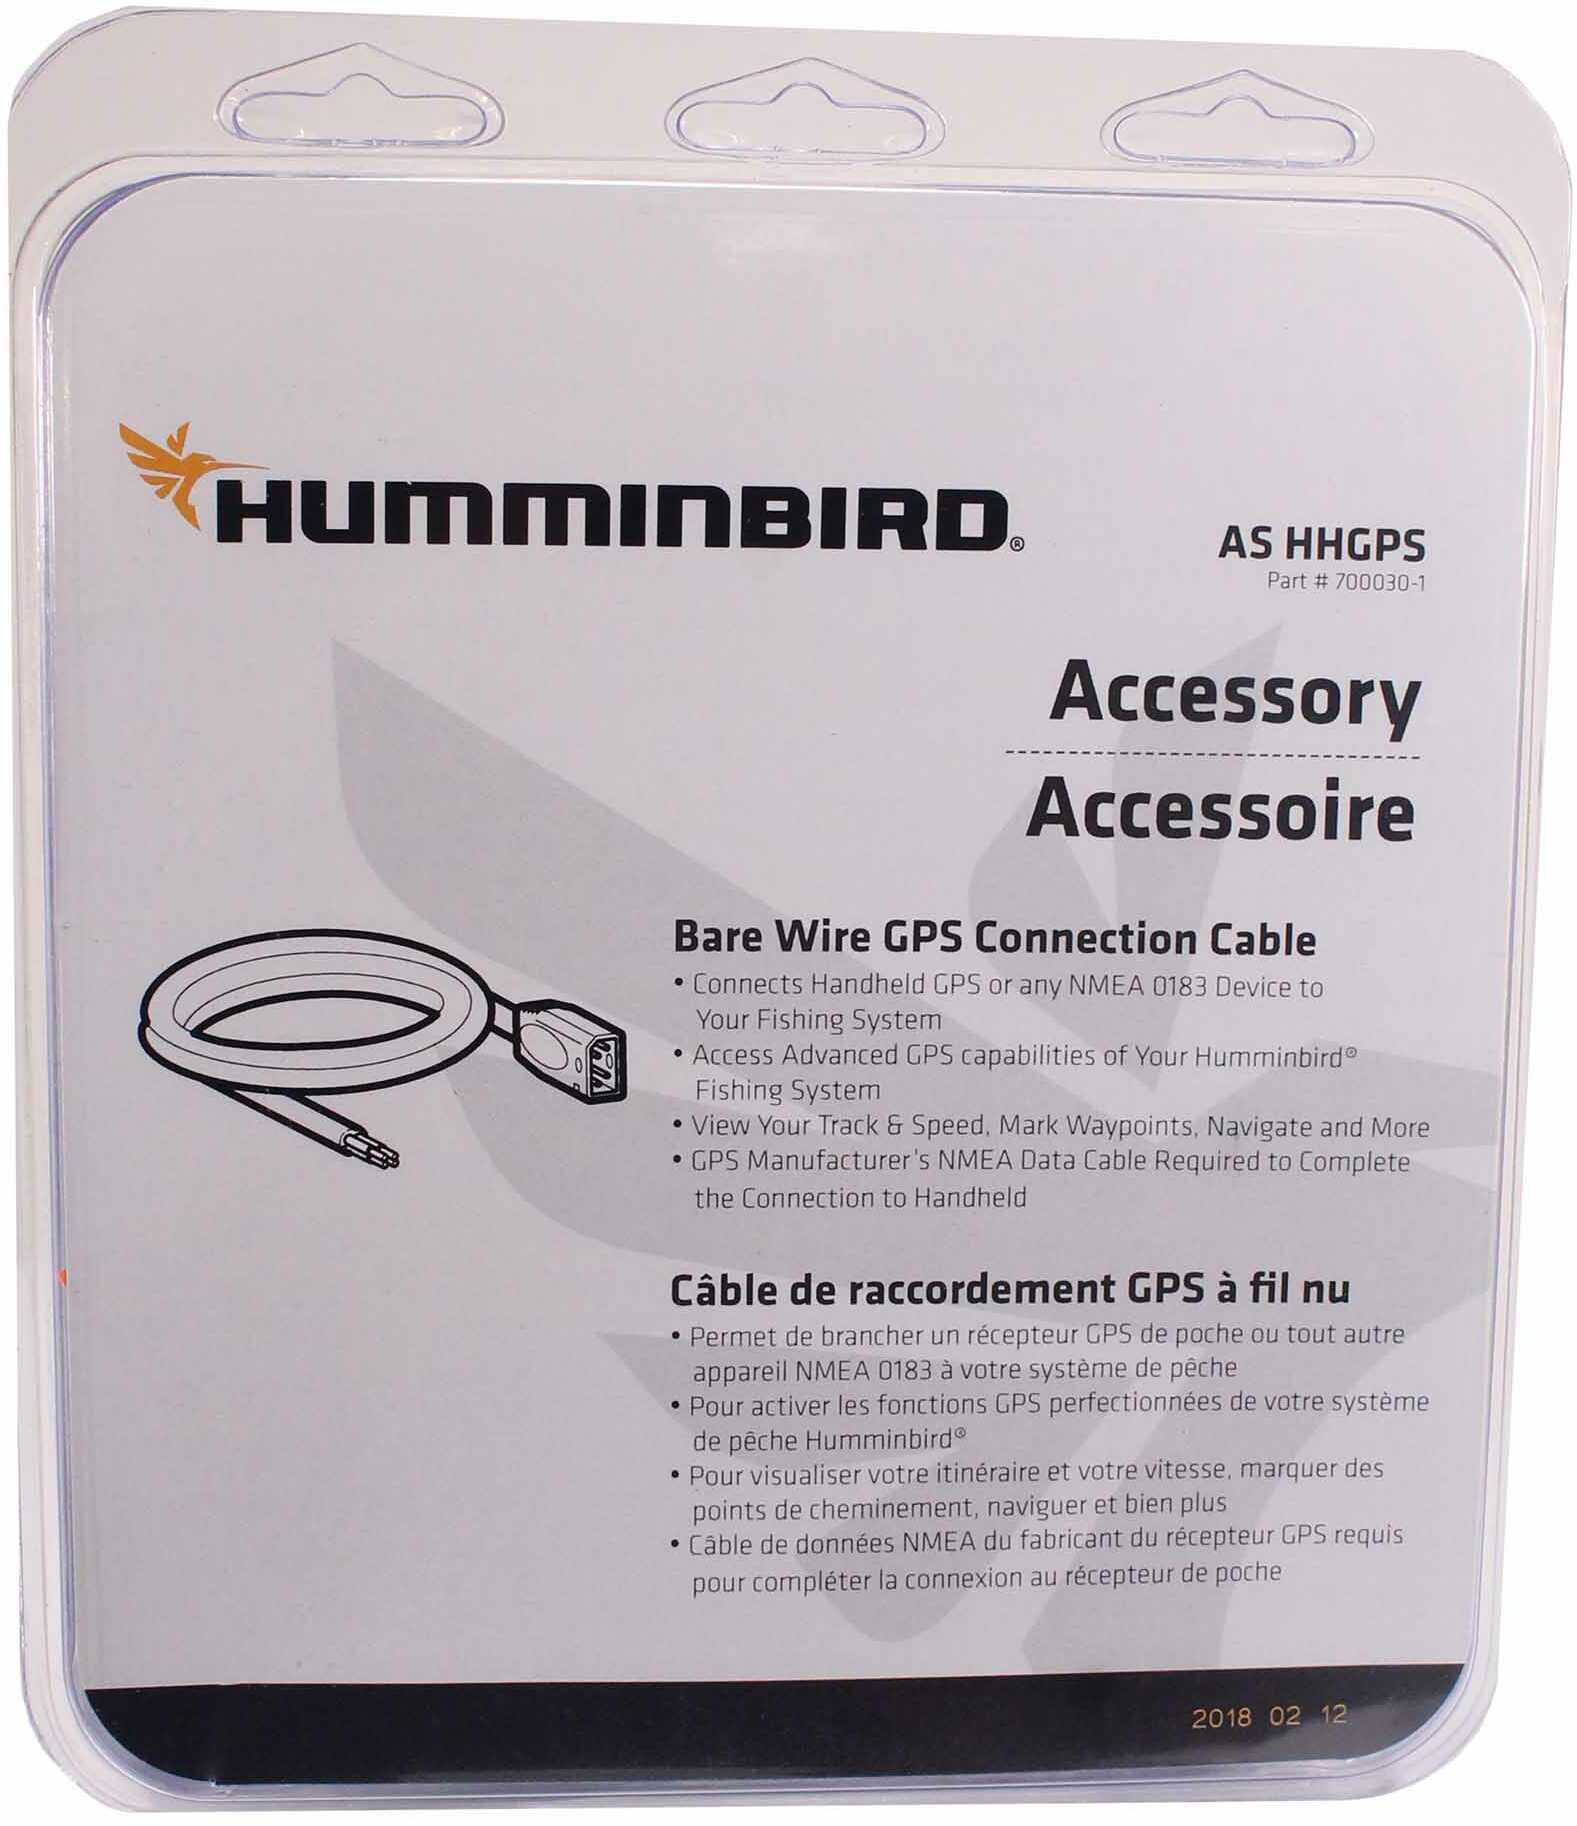 Humminbird Nmea/Gps Cable As Hhgps 700030-1